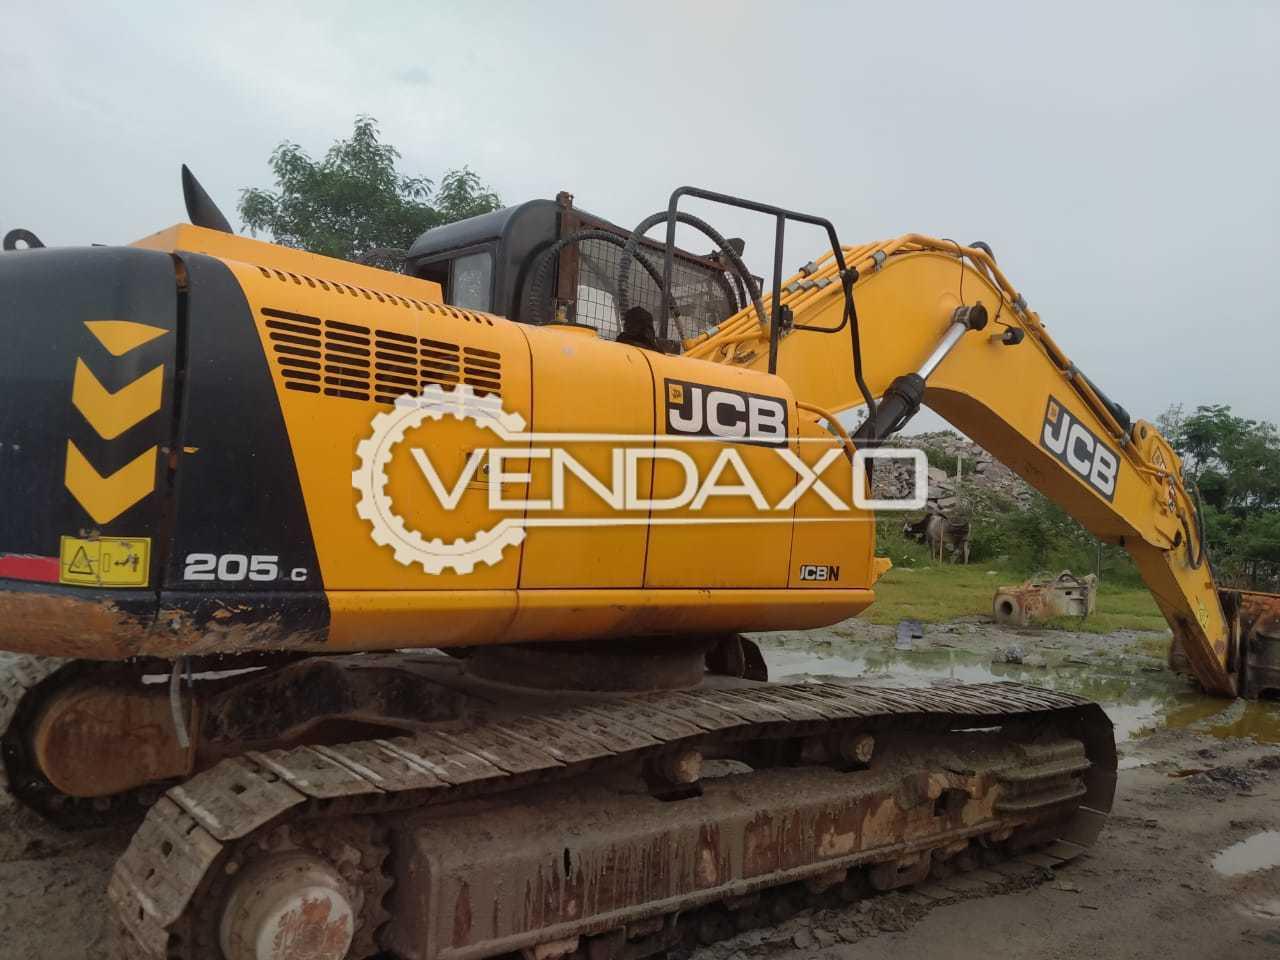 JCB LC205C Excavator - 140 HP, 2020 Model